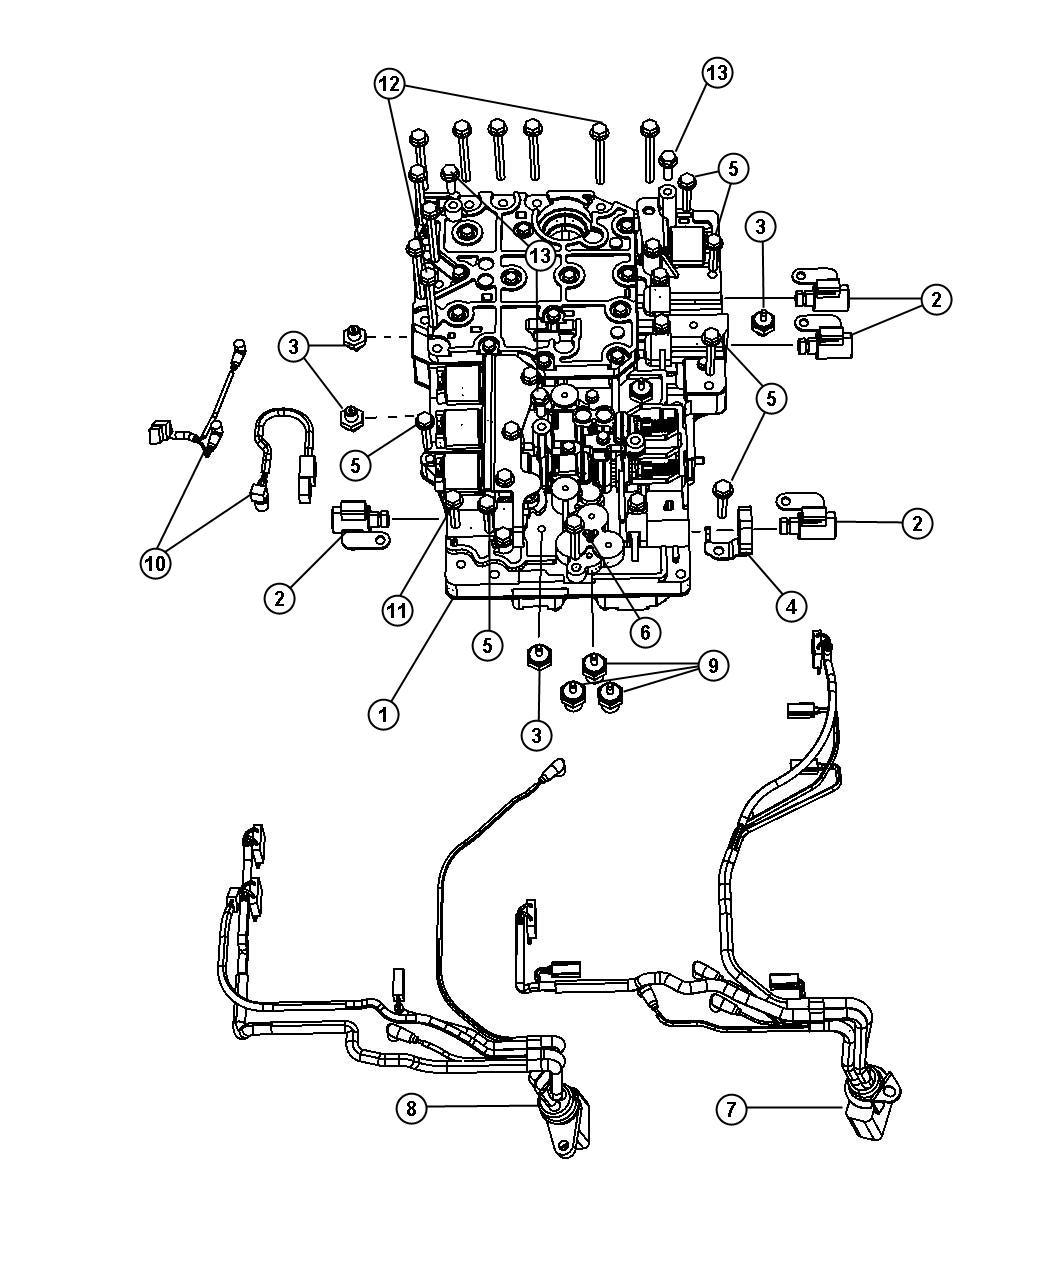 Dodge Ram 5500 Harness, wiring. Transmission. 12 pin